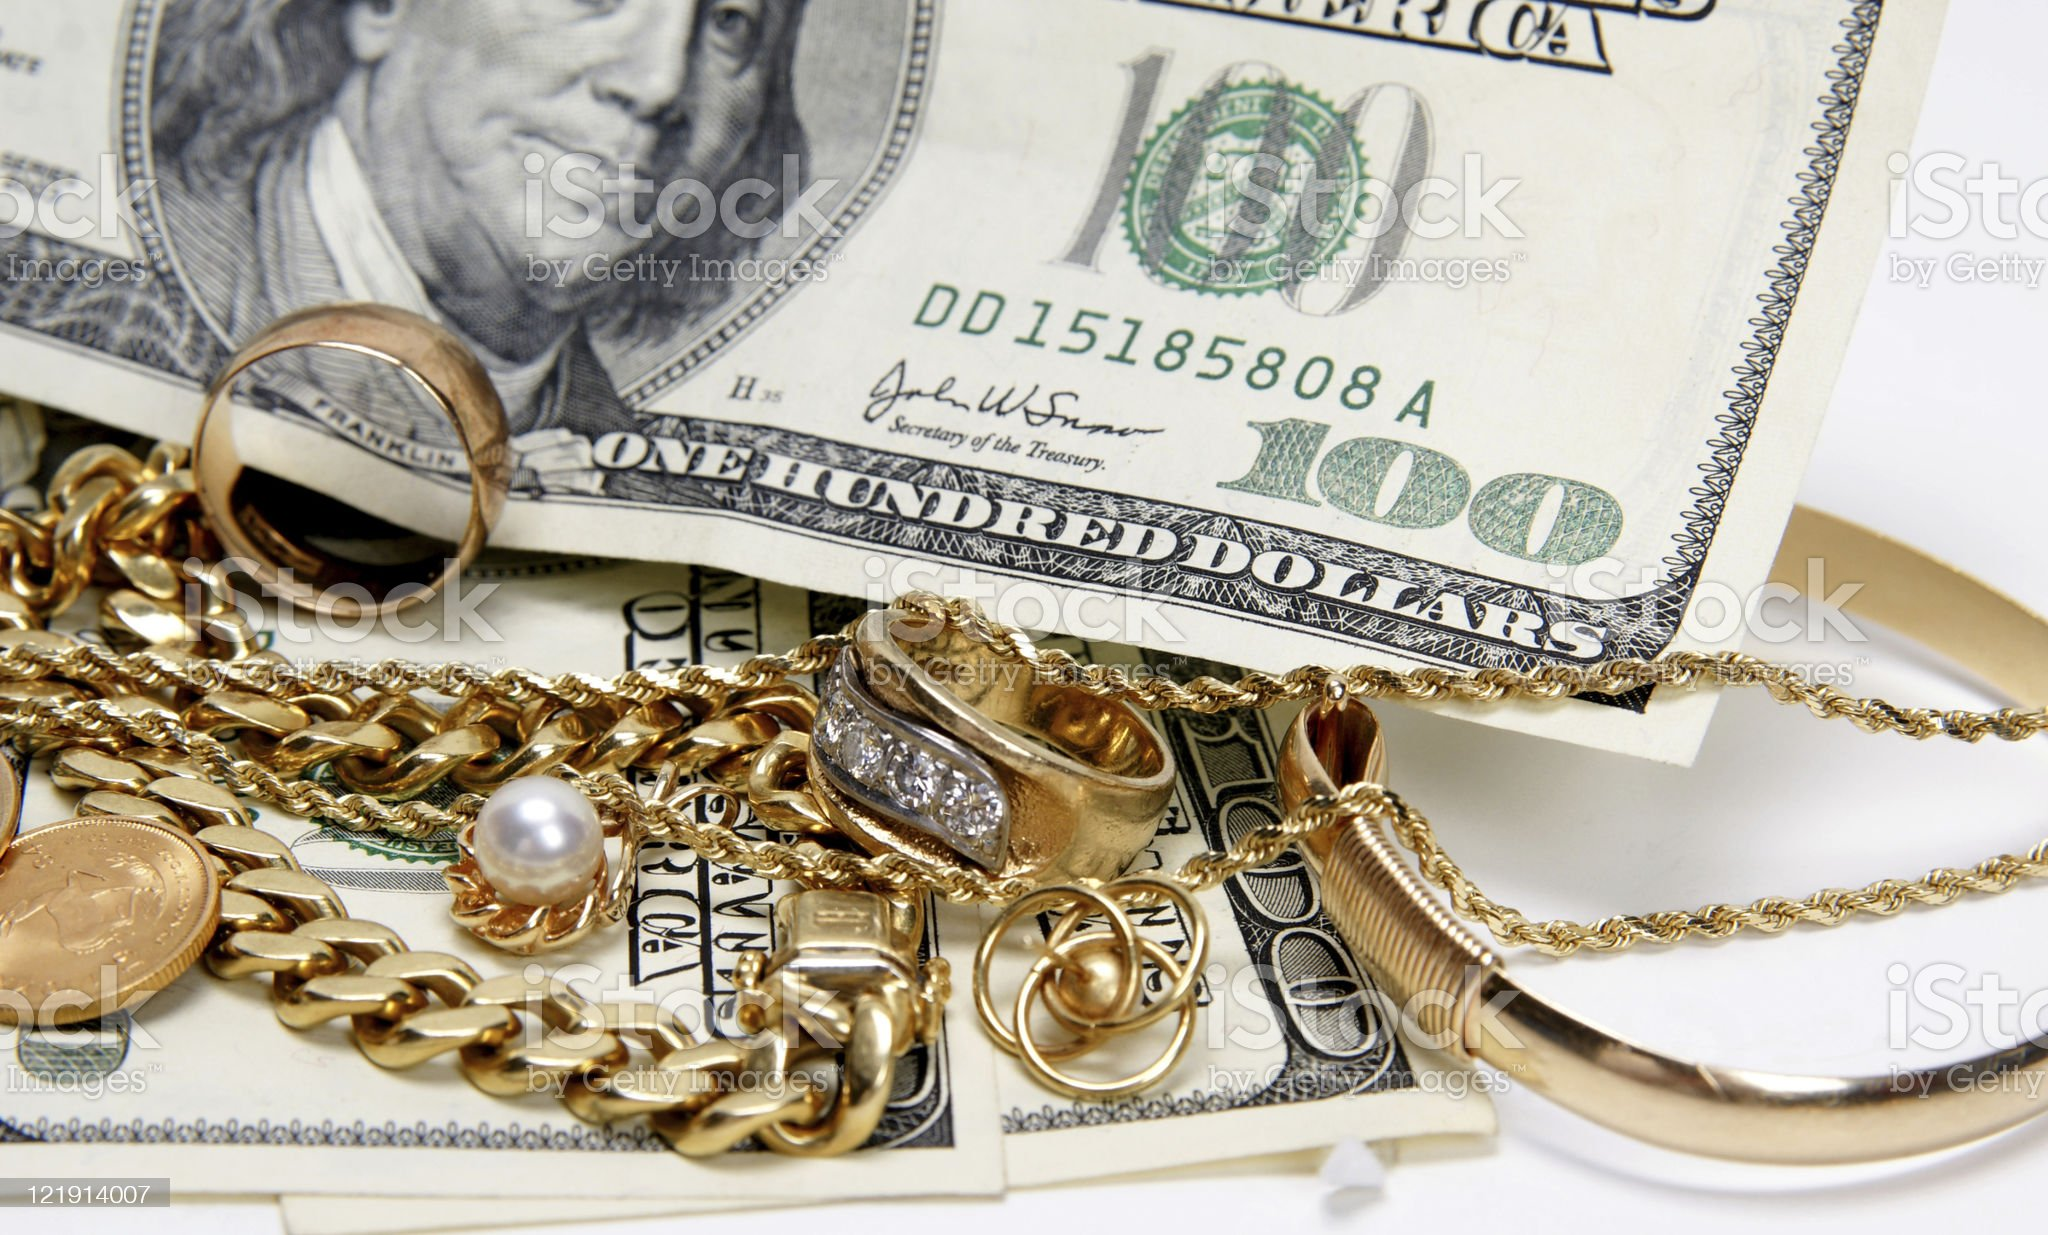 I buy gold jewelry royalty-free stock photo